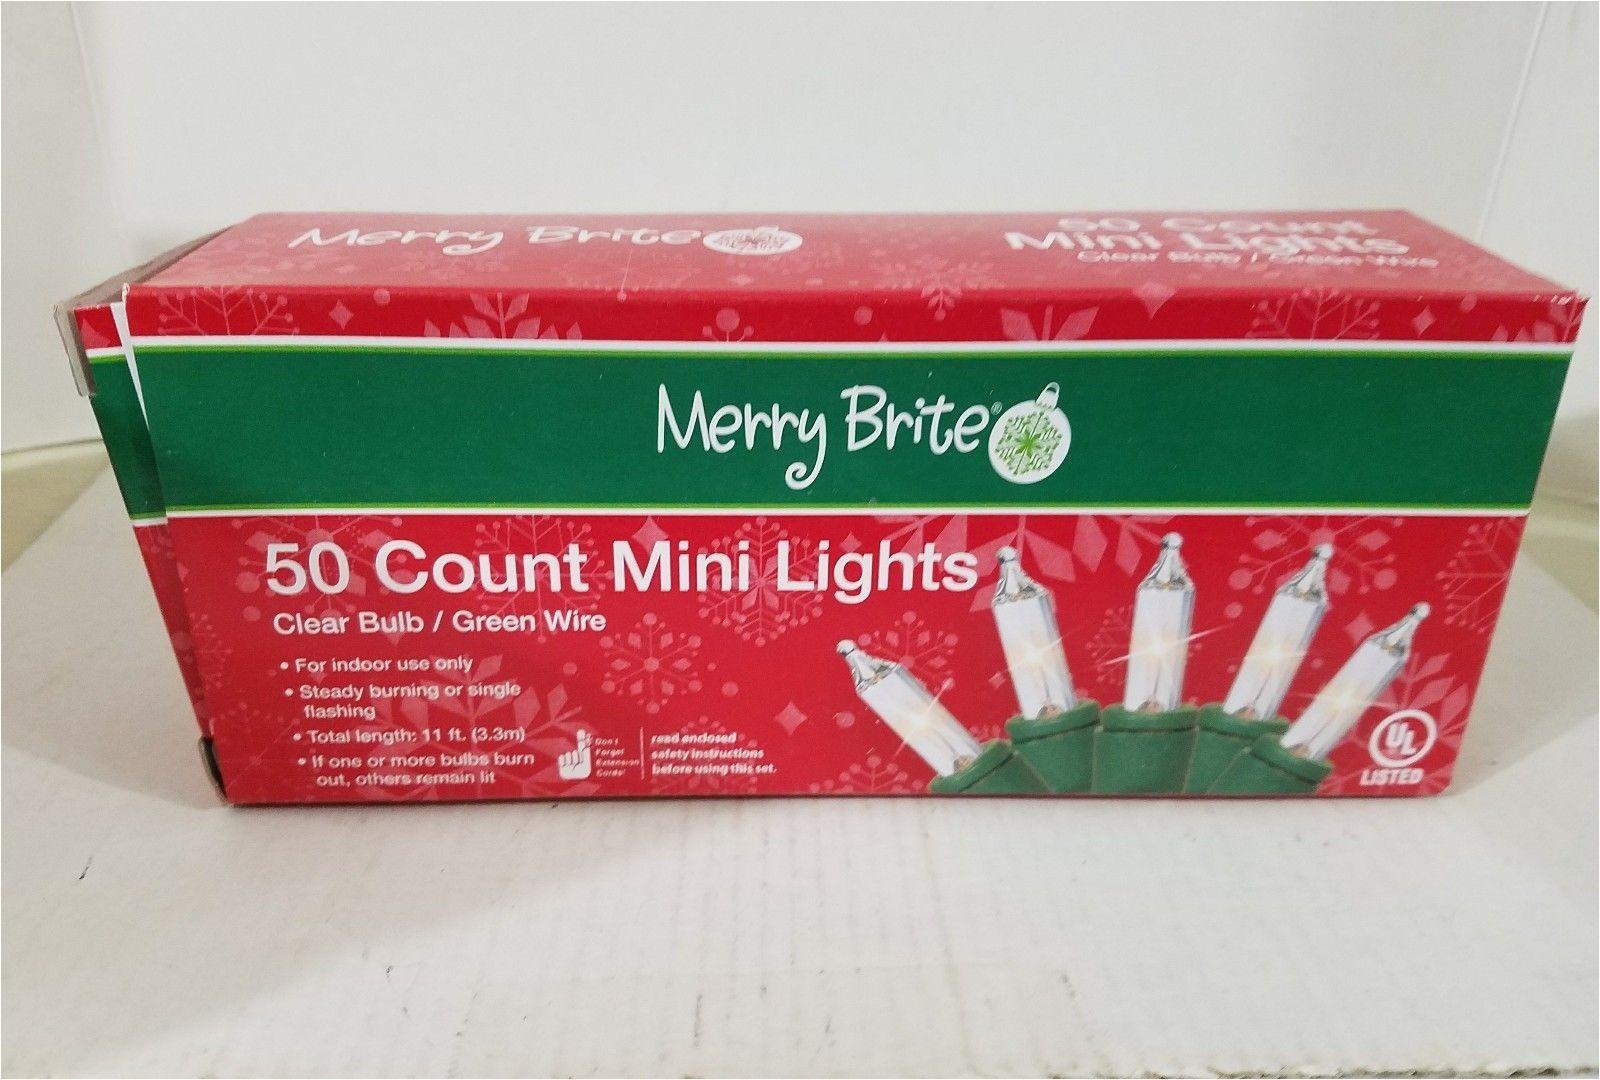 Merry Brite Lights Merry Brite 50 Ct Mini Lights Clear Bulb Christmas Lights New